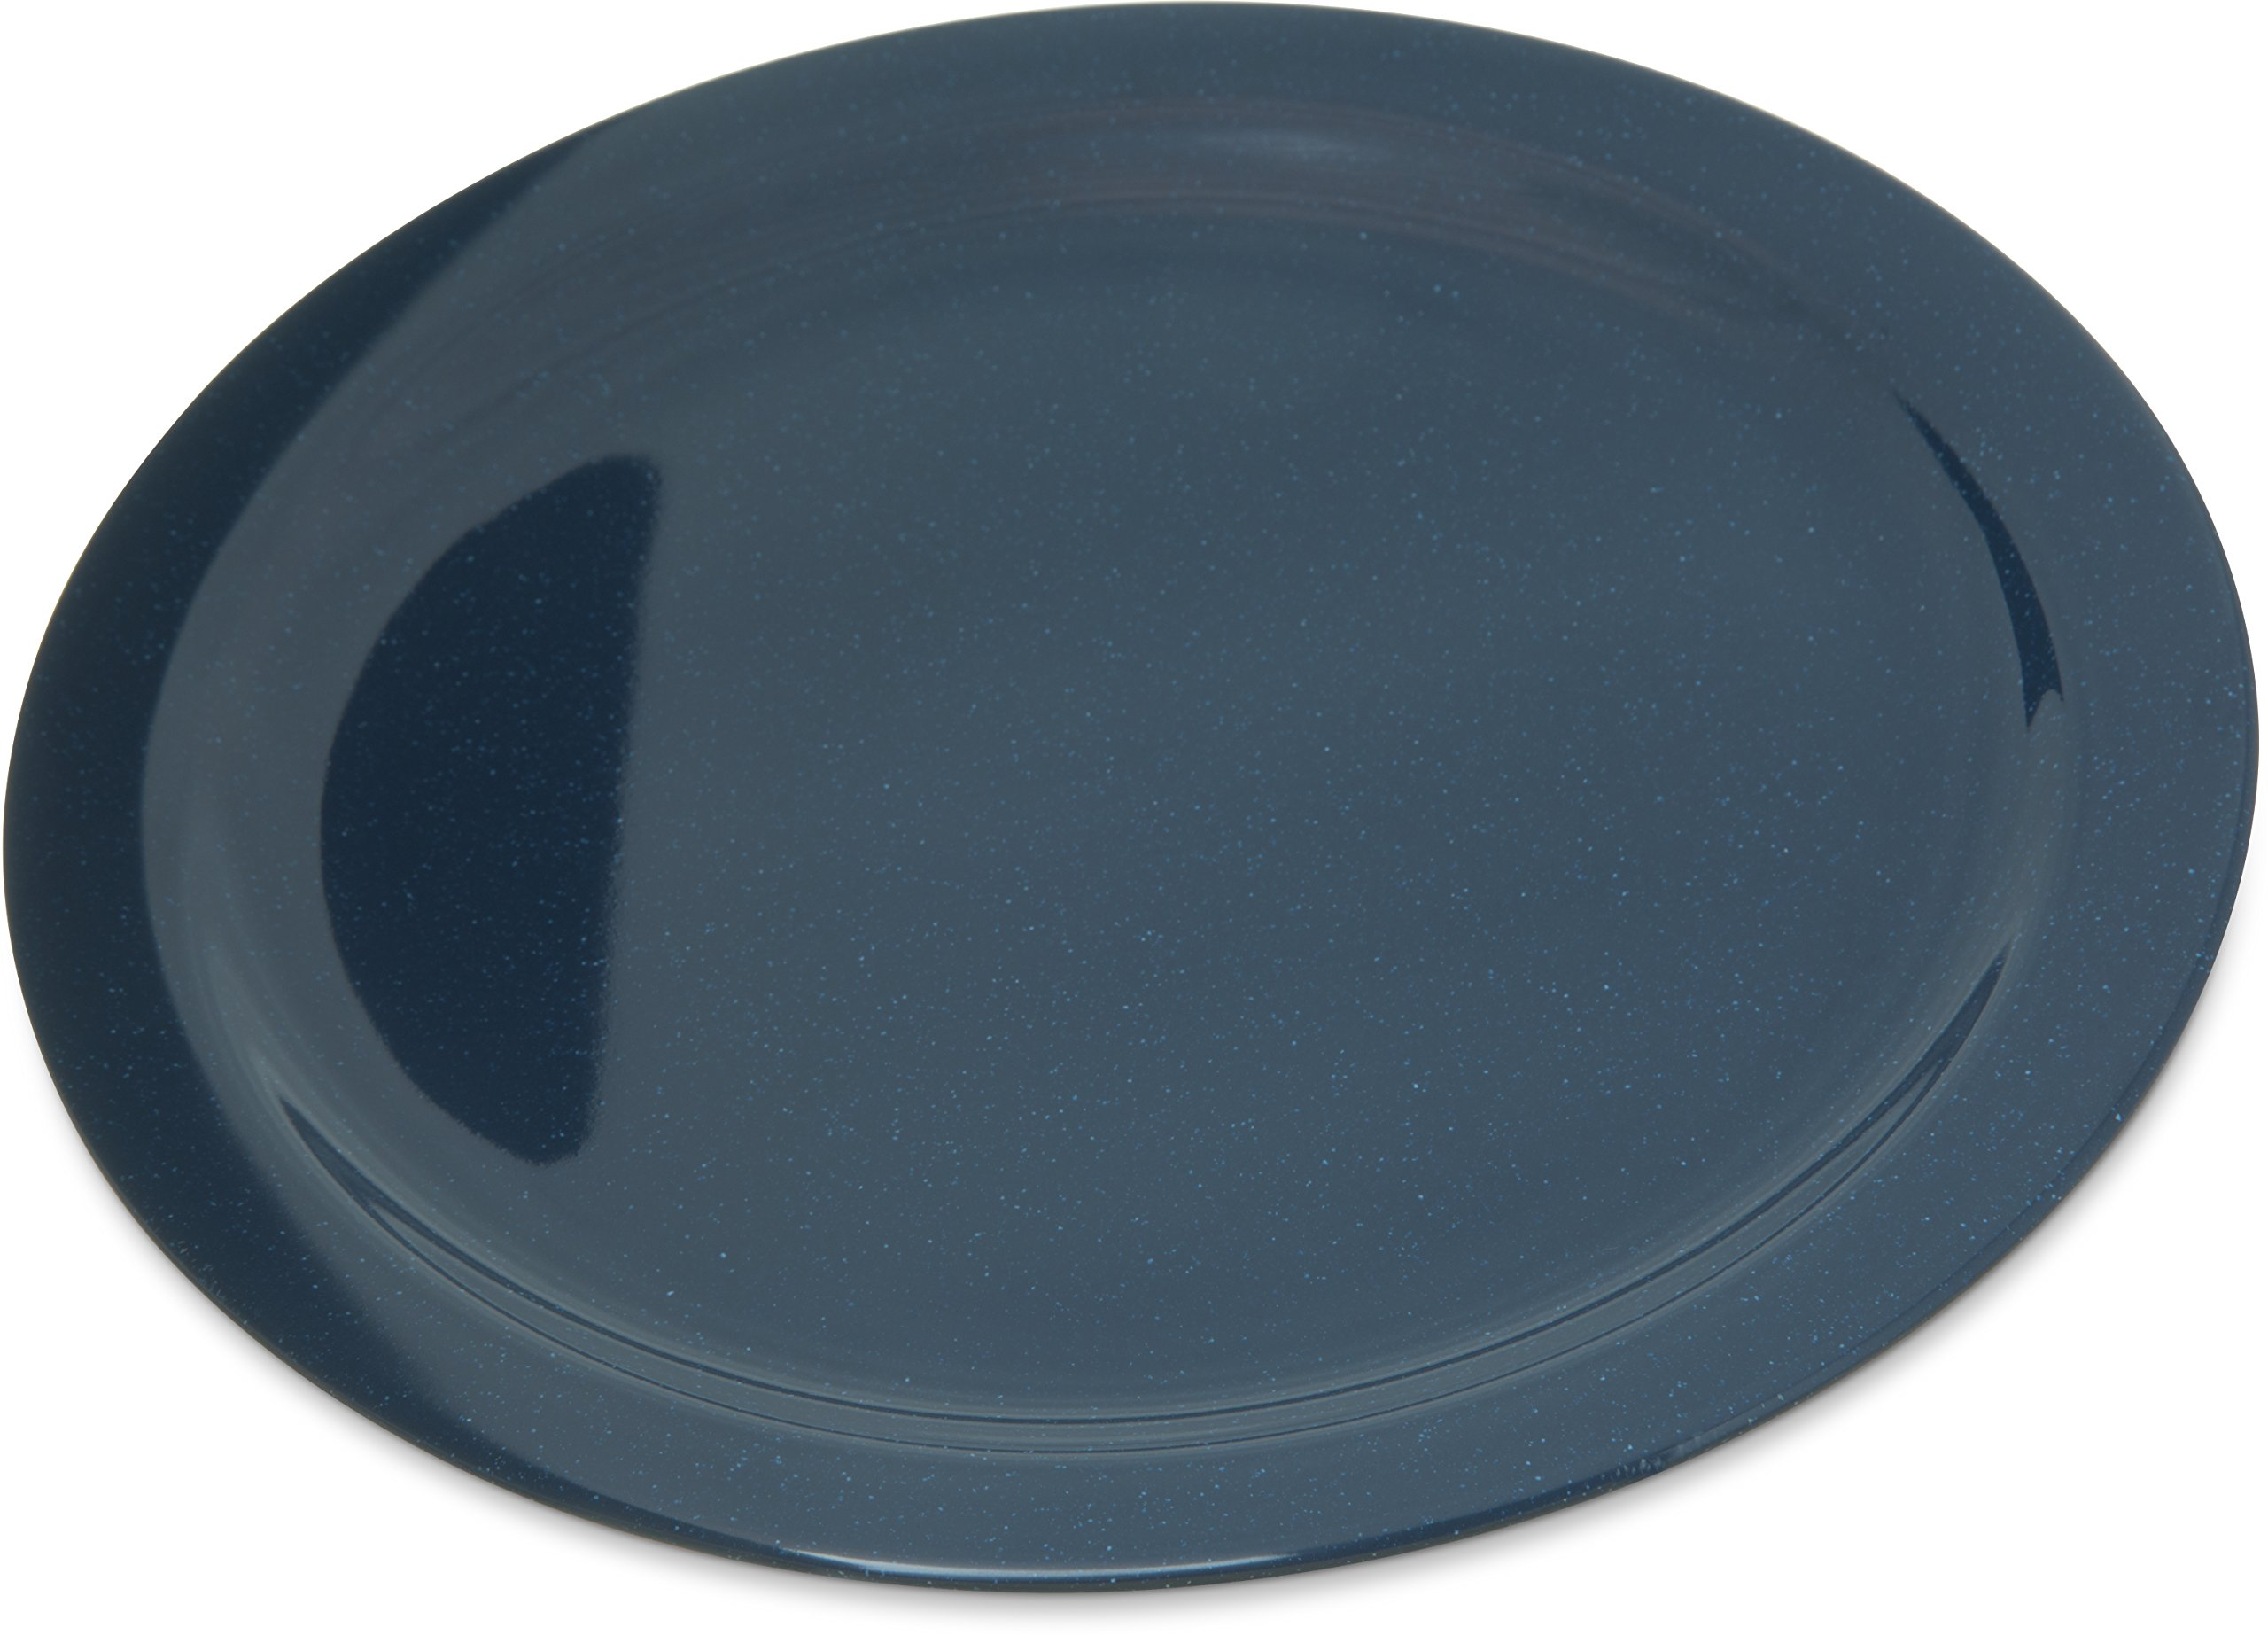 Carlisle 4350035 Dallas Ware Melamine Dinner Plate, 10.20'' Dia. x 0.84'' H, Cafe Blue (Case of 48) by Carlisle (Image #1)